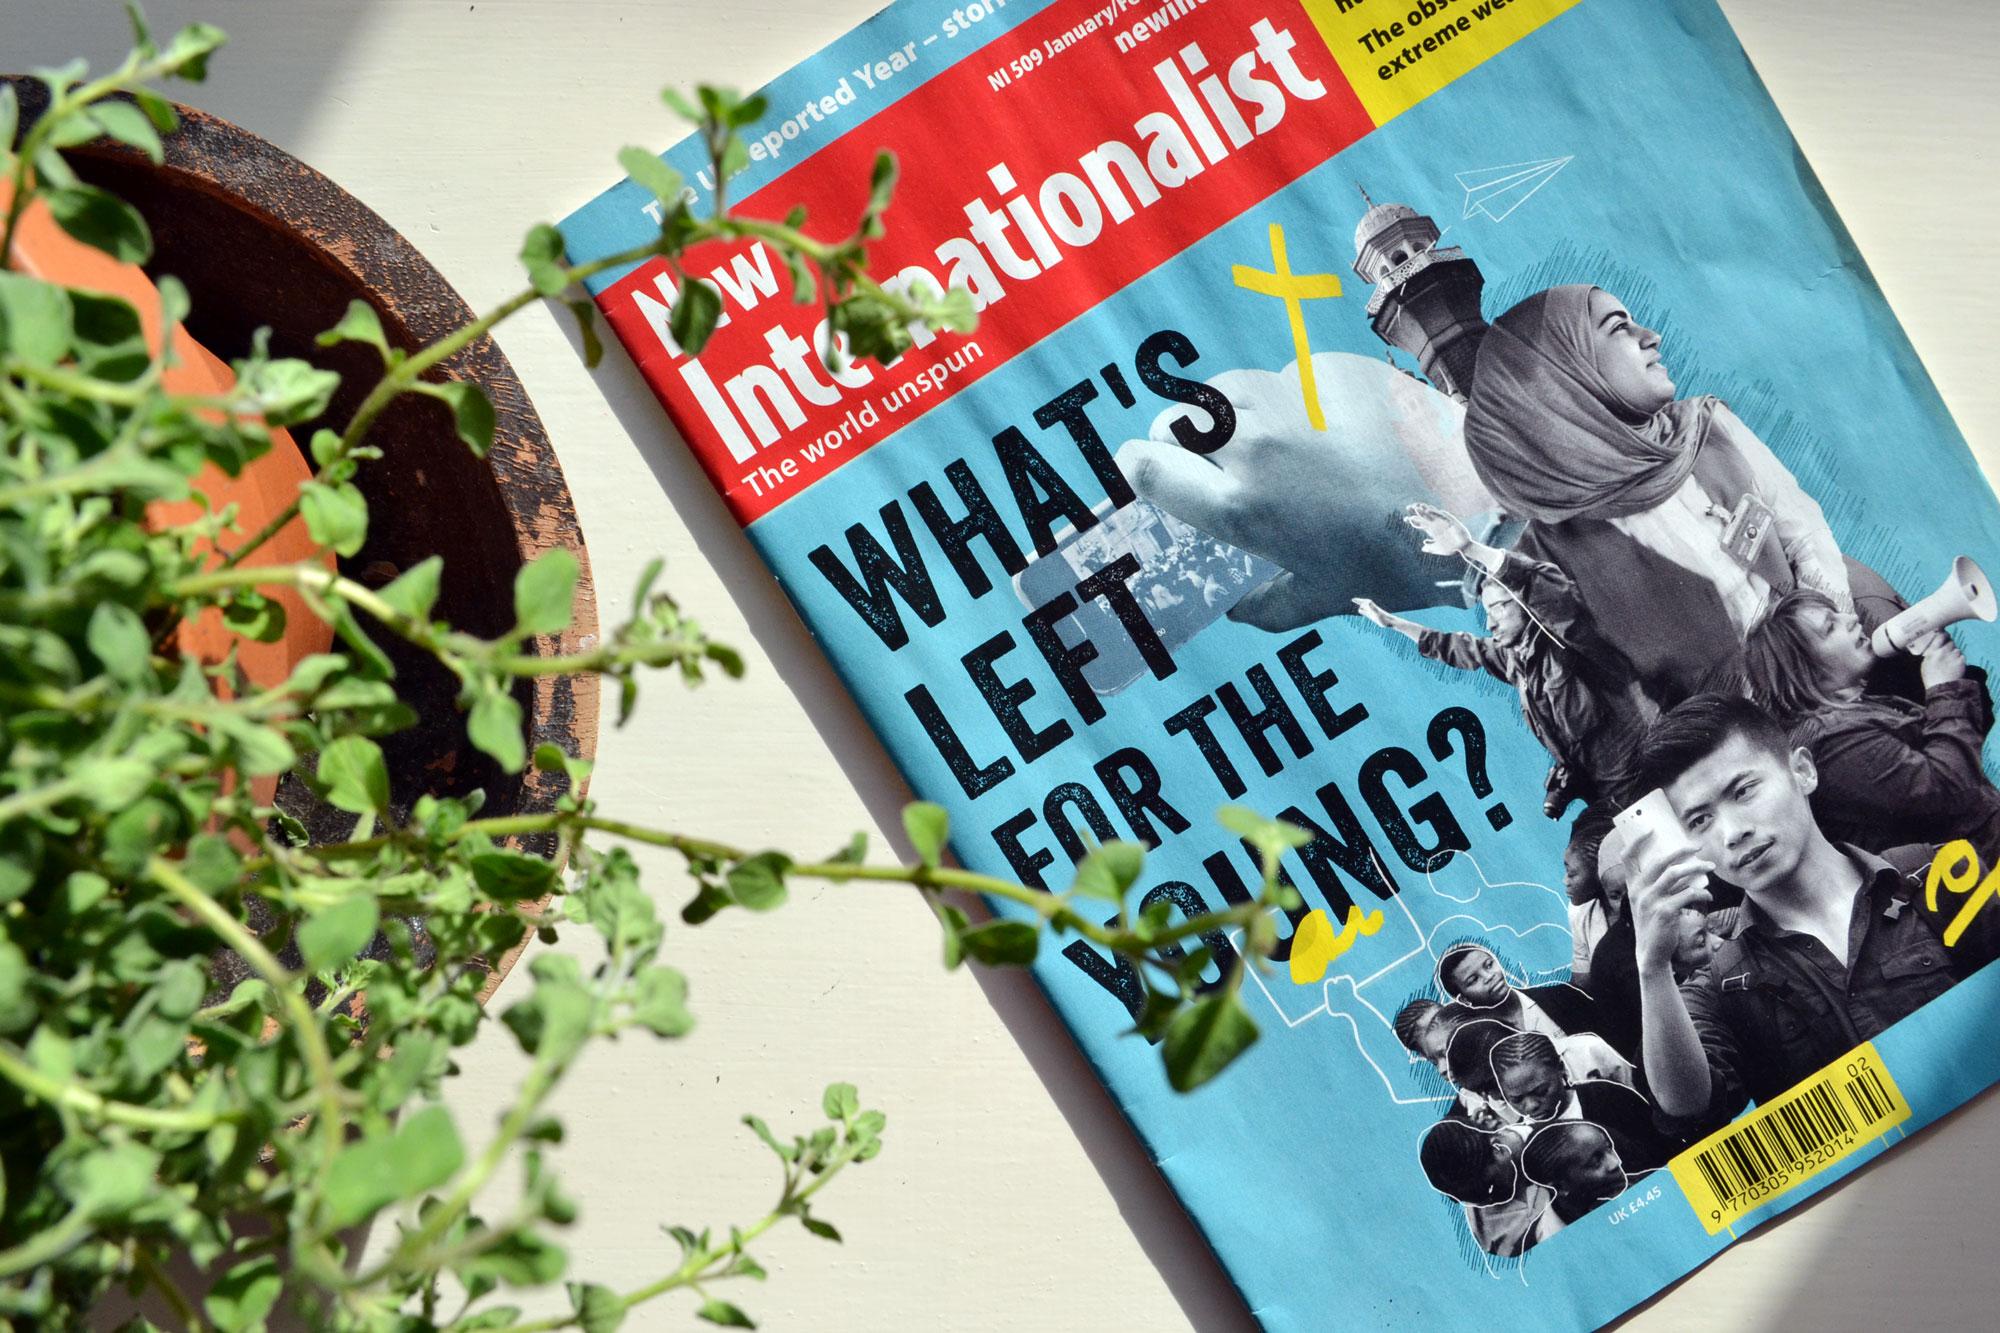 New Internationalist cover design